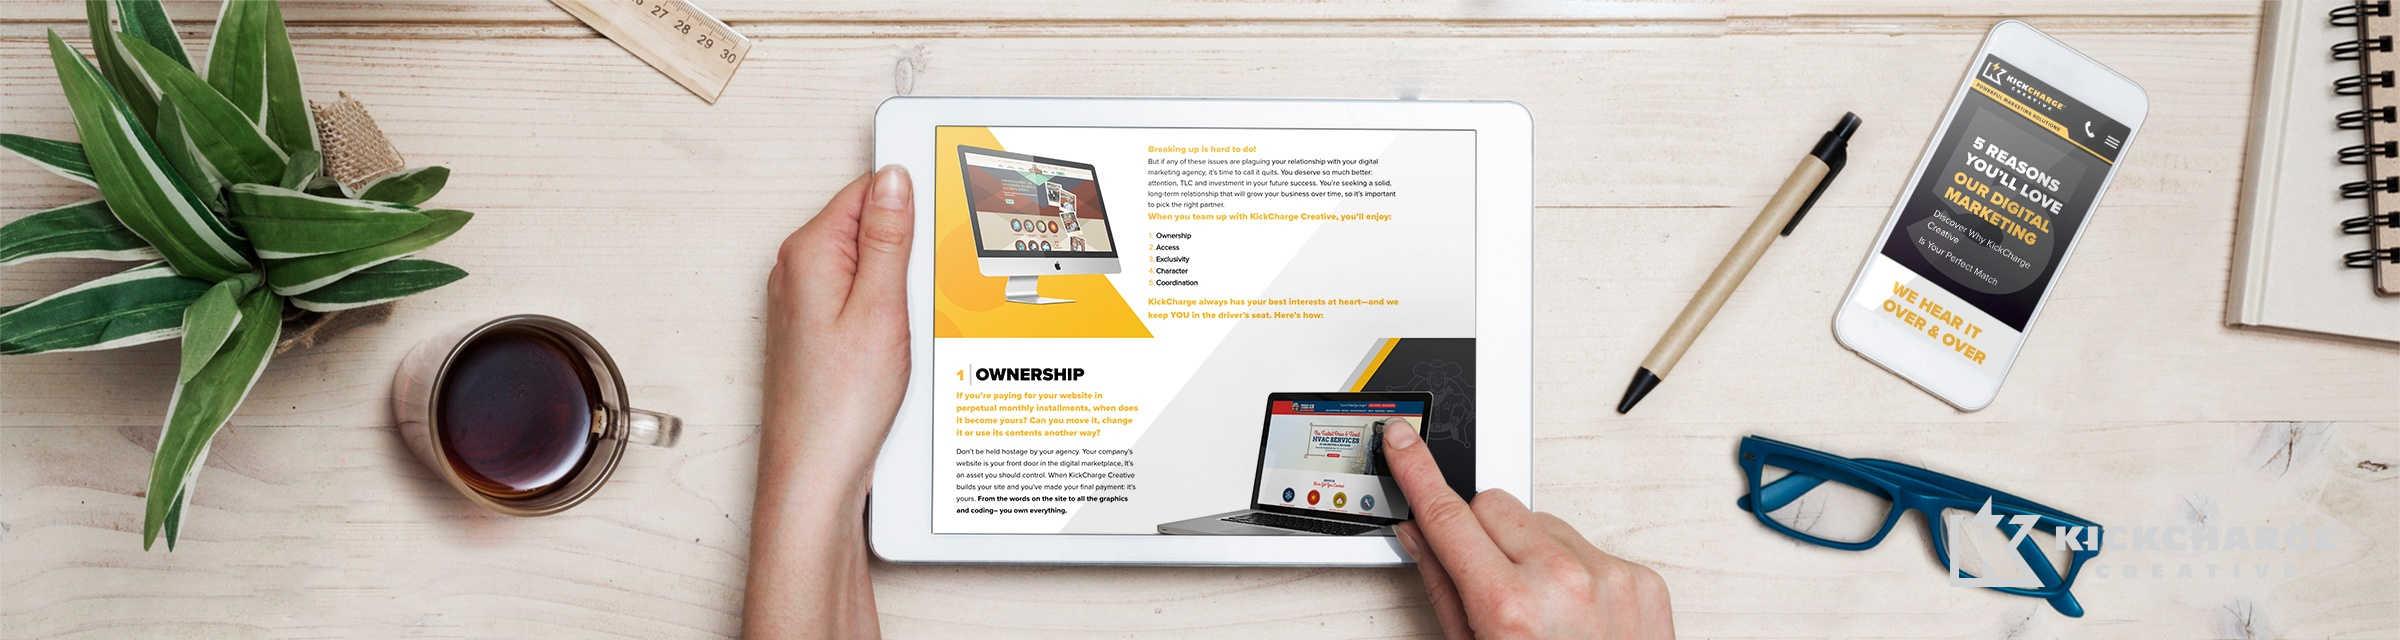 Choose Your Digital Marketing Partner Wisely - KickCharge